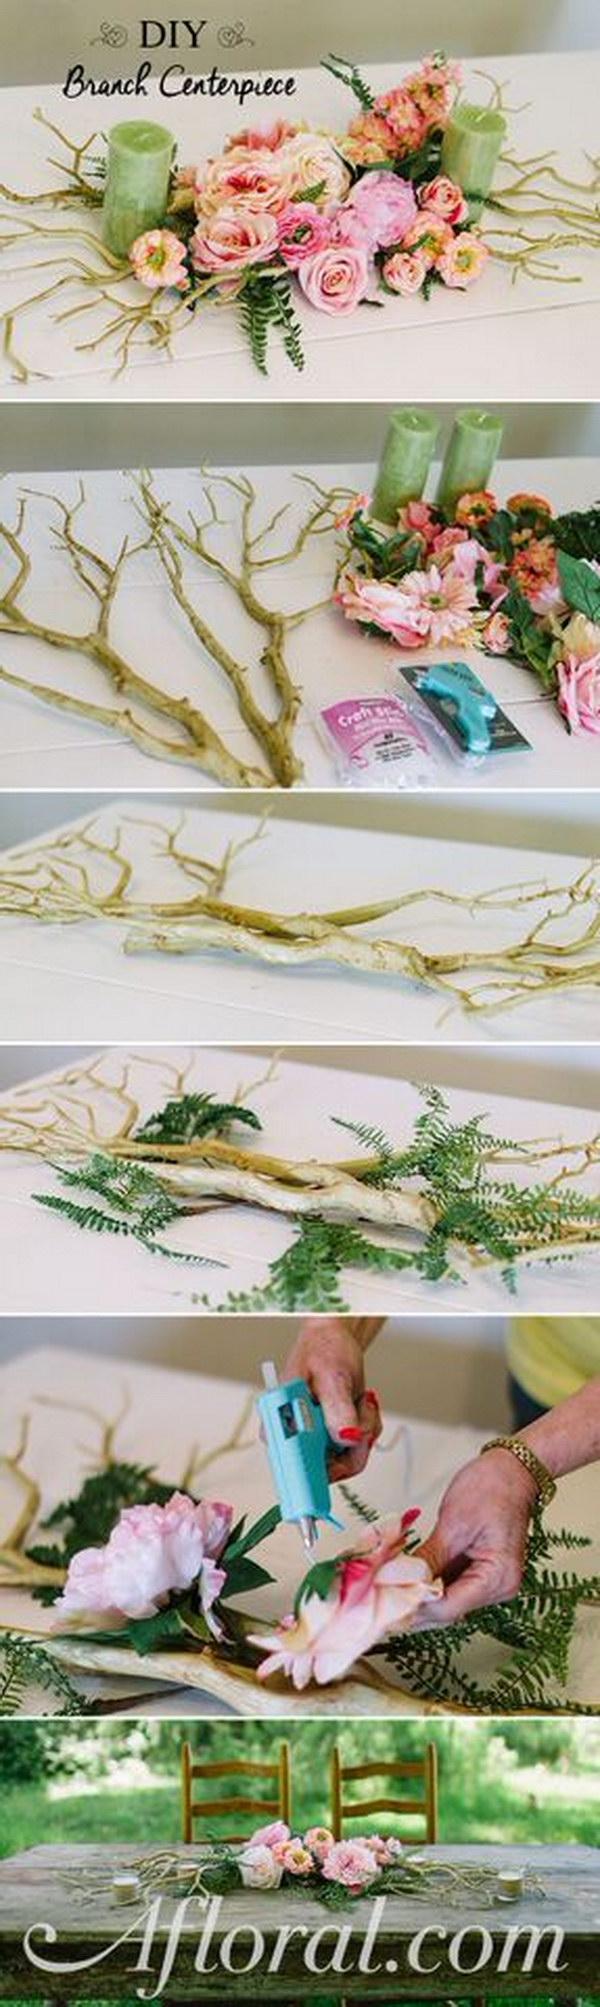 DIY Branch Centerpiece